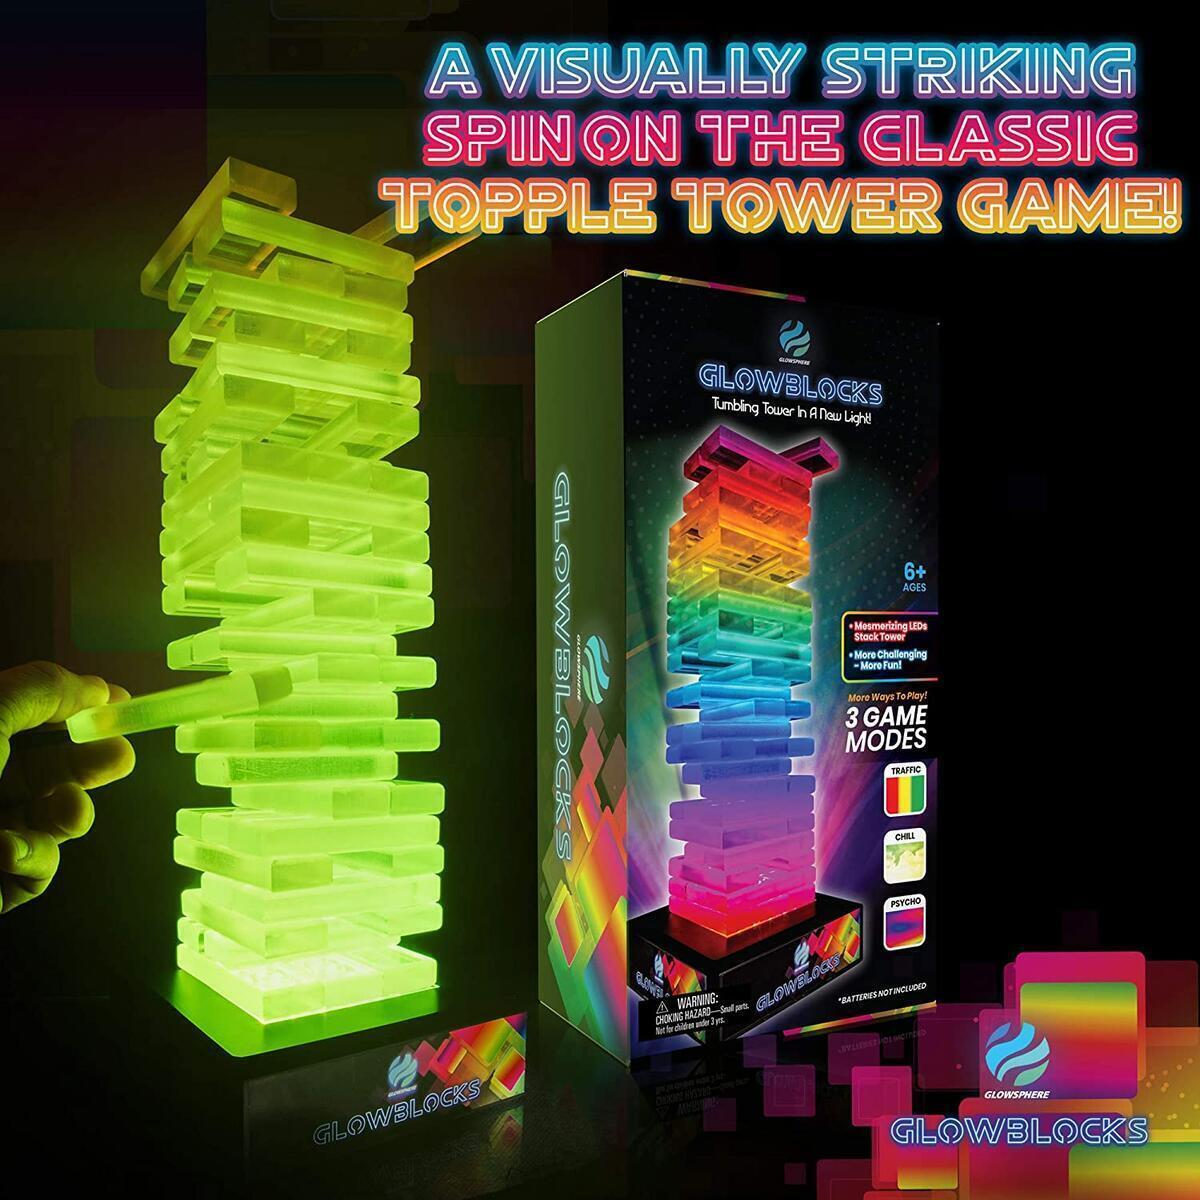 Glowblocks Light-Up Tumbling Tower Game